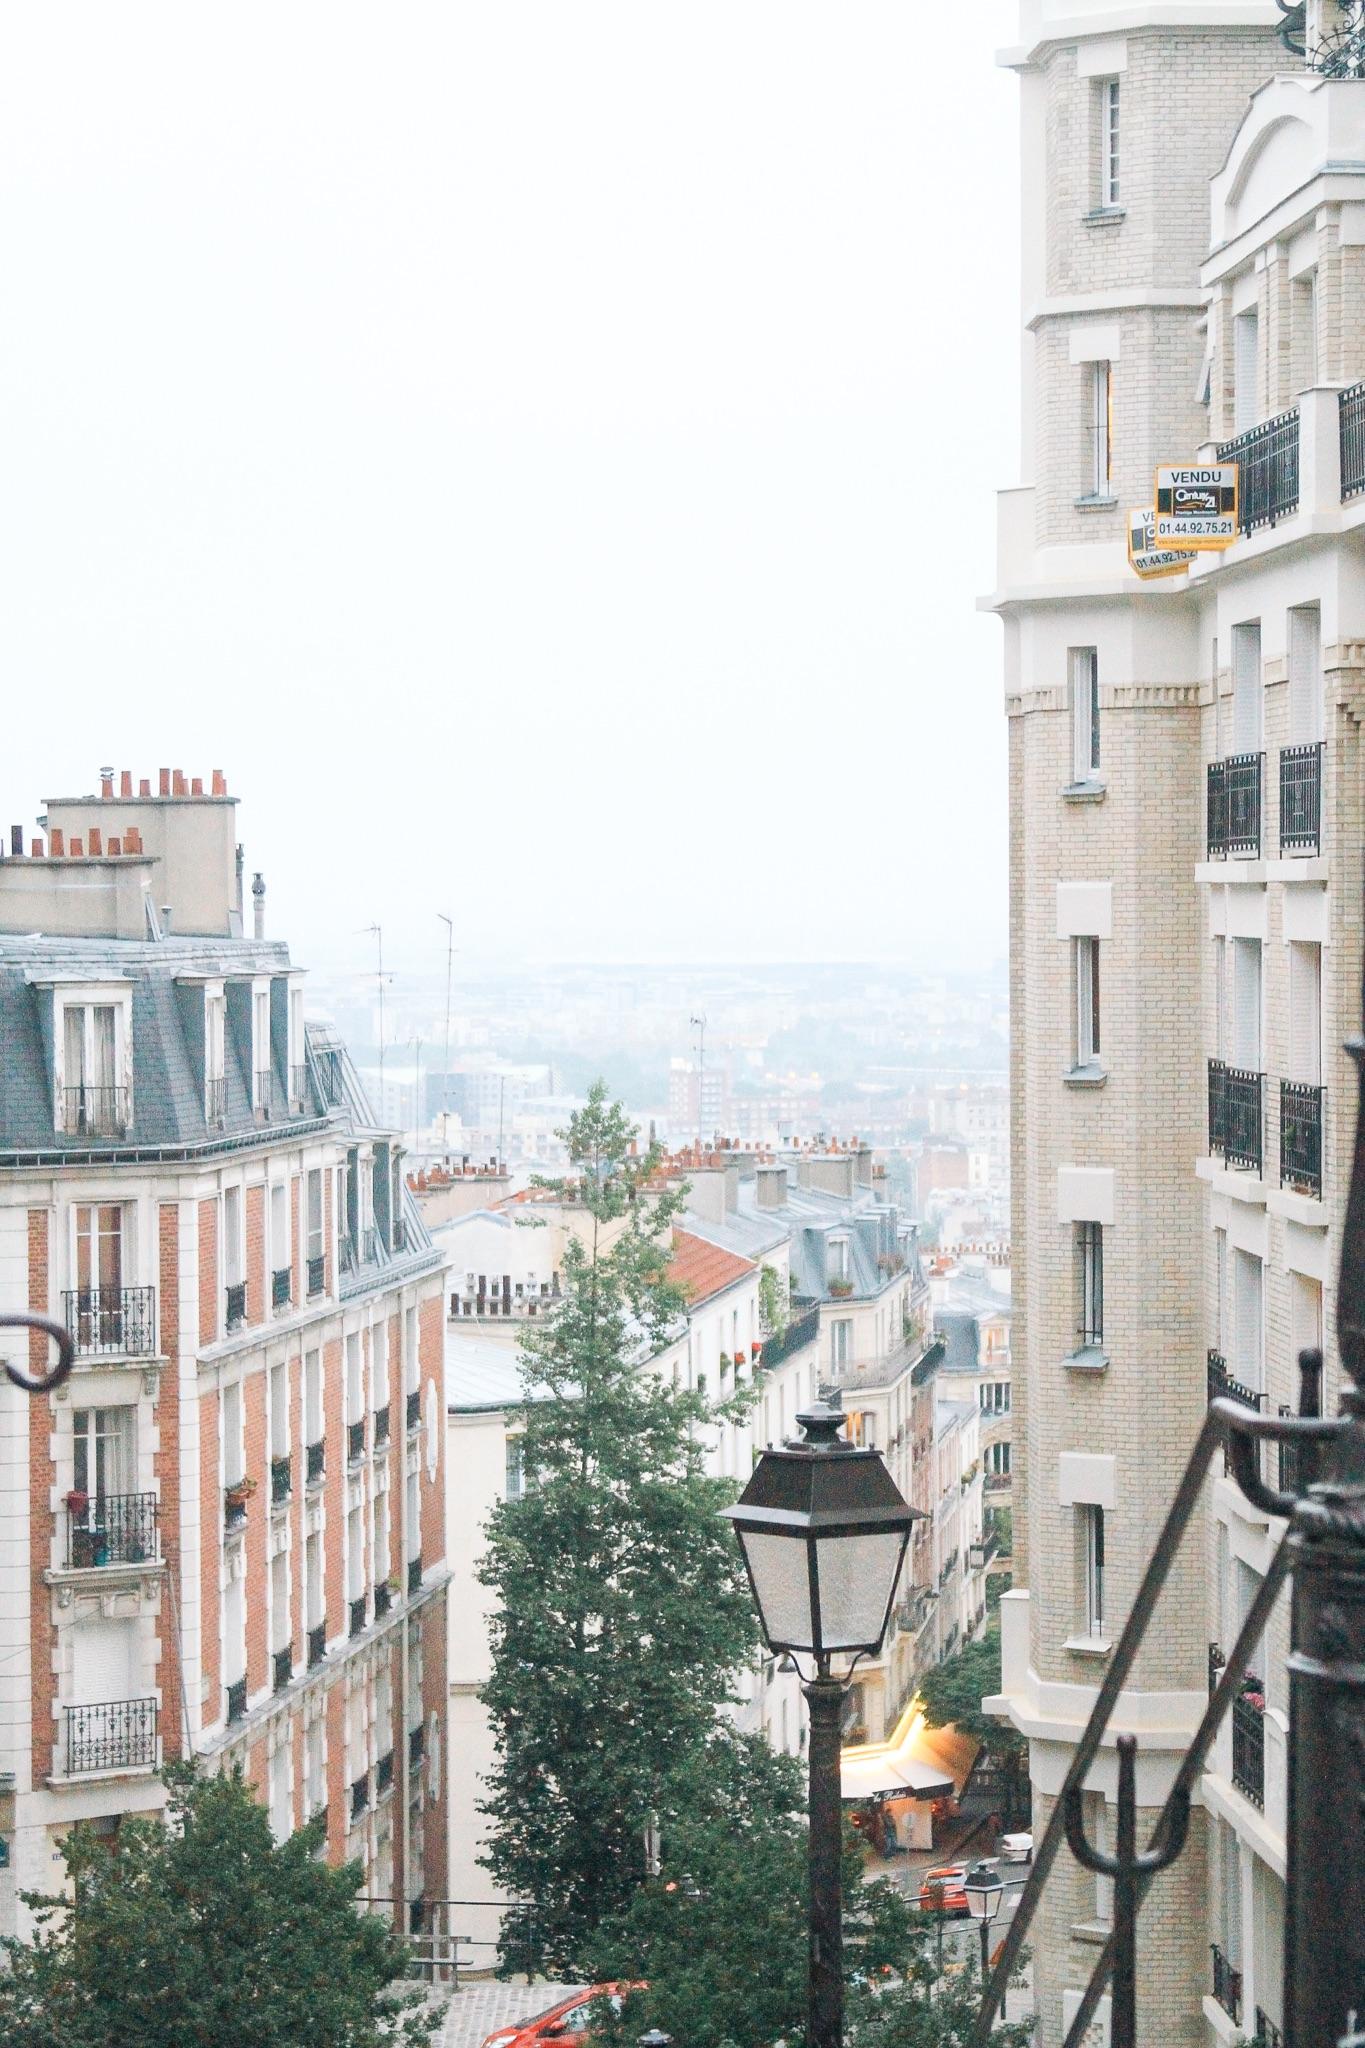 Paris-Walking-Guide-MonicaFrancis-2.jpeg